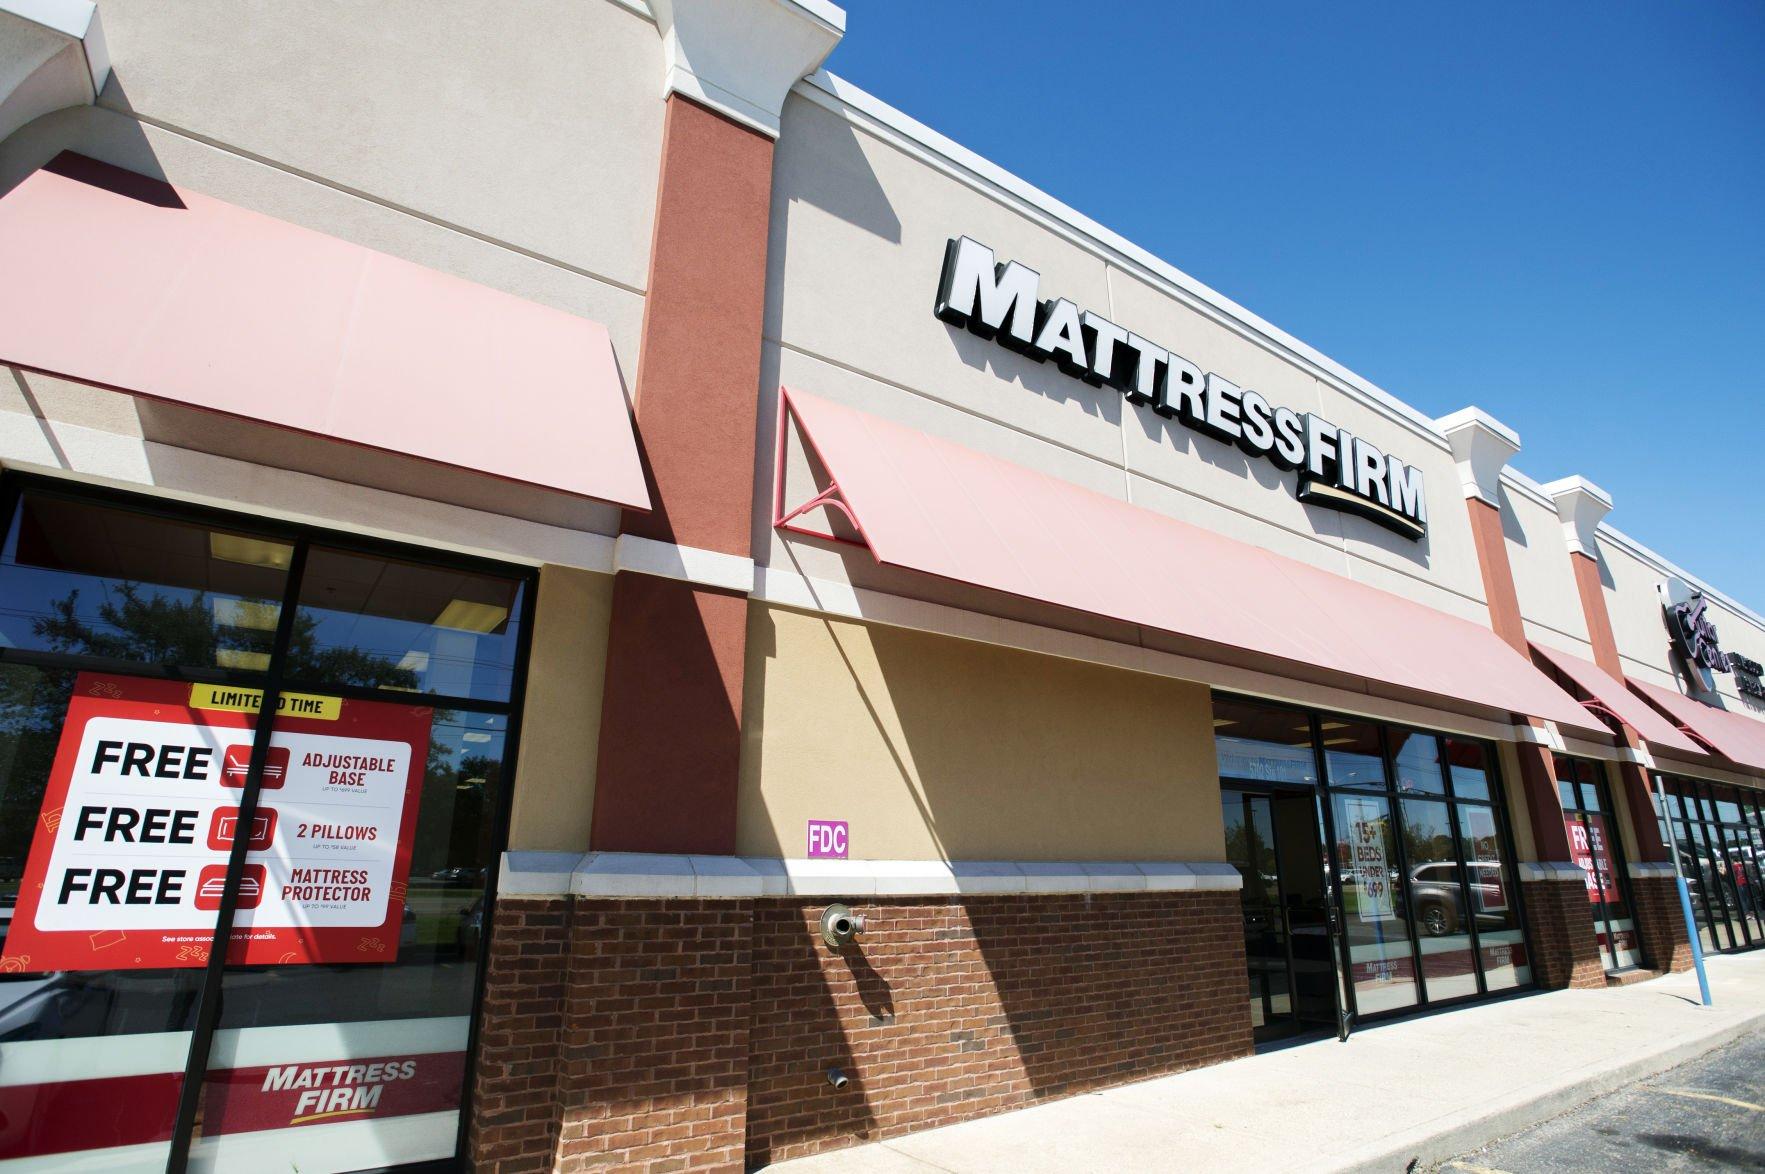 Flipboard Mattress Firm Closing Baton Rouge Lafayette Stores